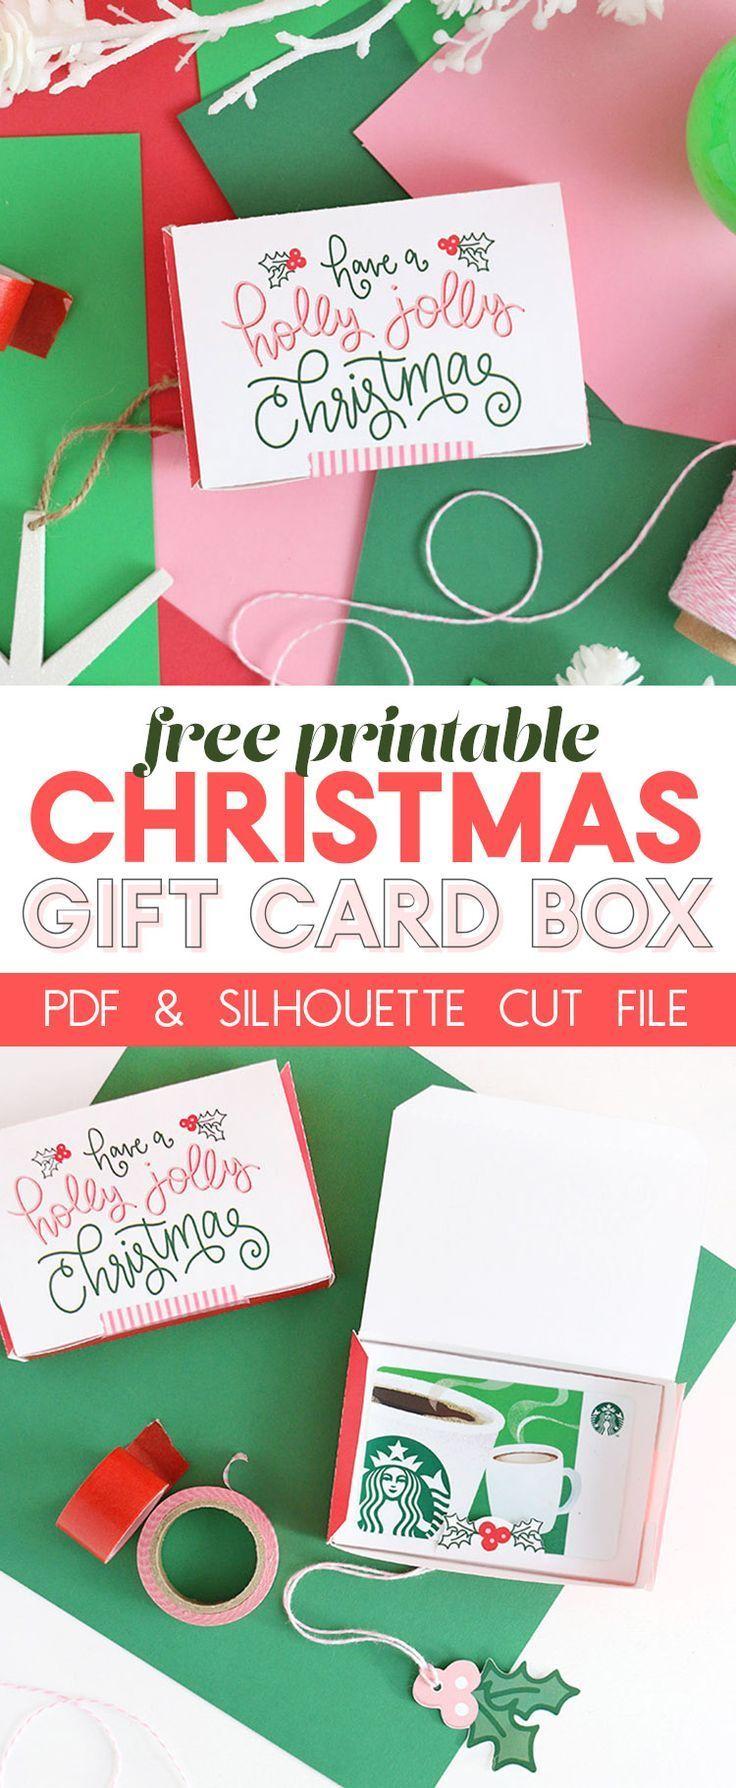 DIY Gift Card Box - Free Printable Gift Idea for Christmas | Free ...